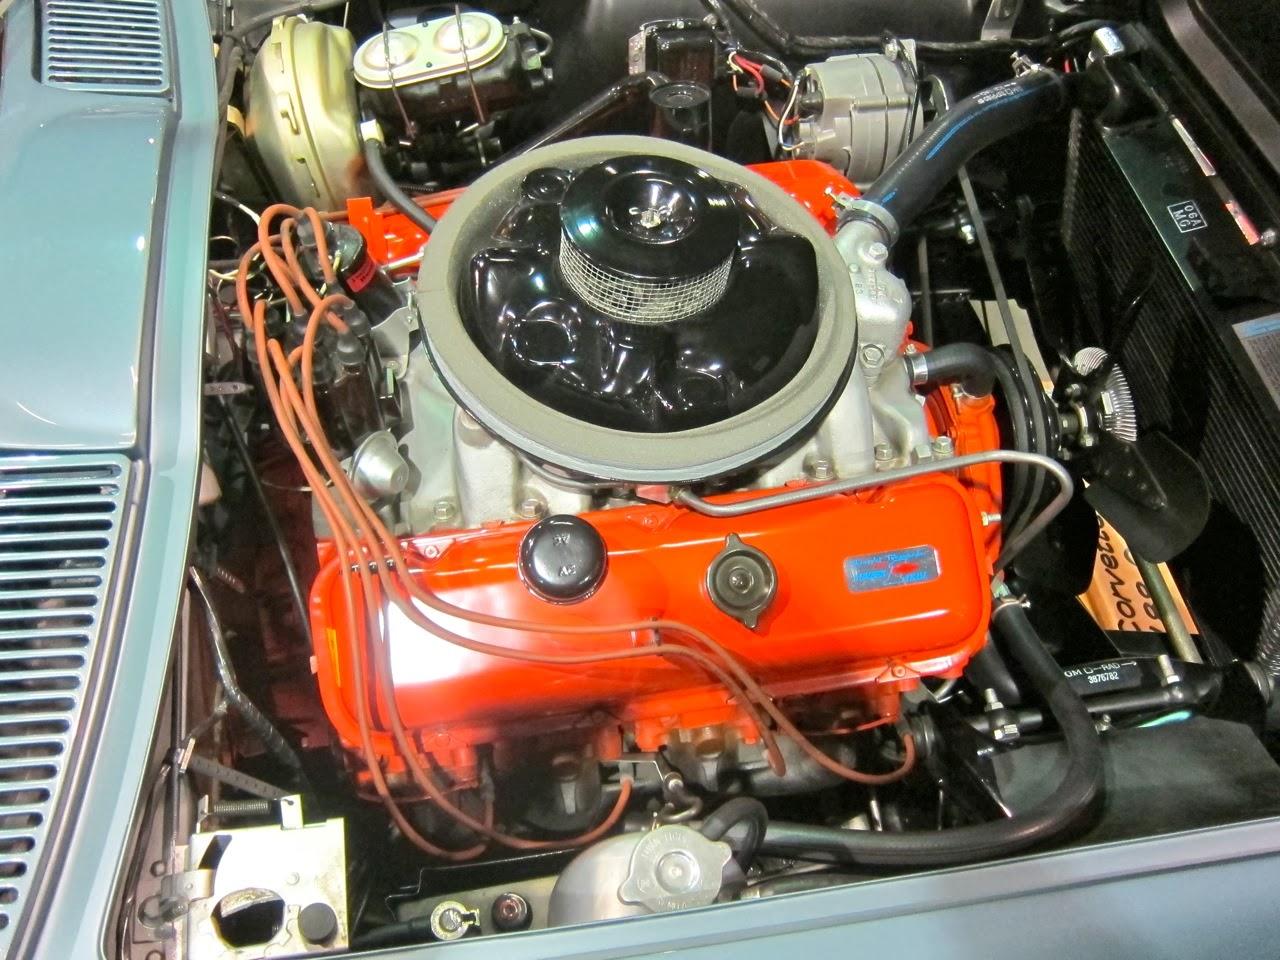 L88 CORVETTES: RAREST OF RARE AT MCACN! - Car Guy Chronicles